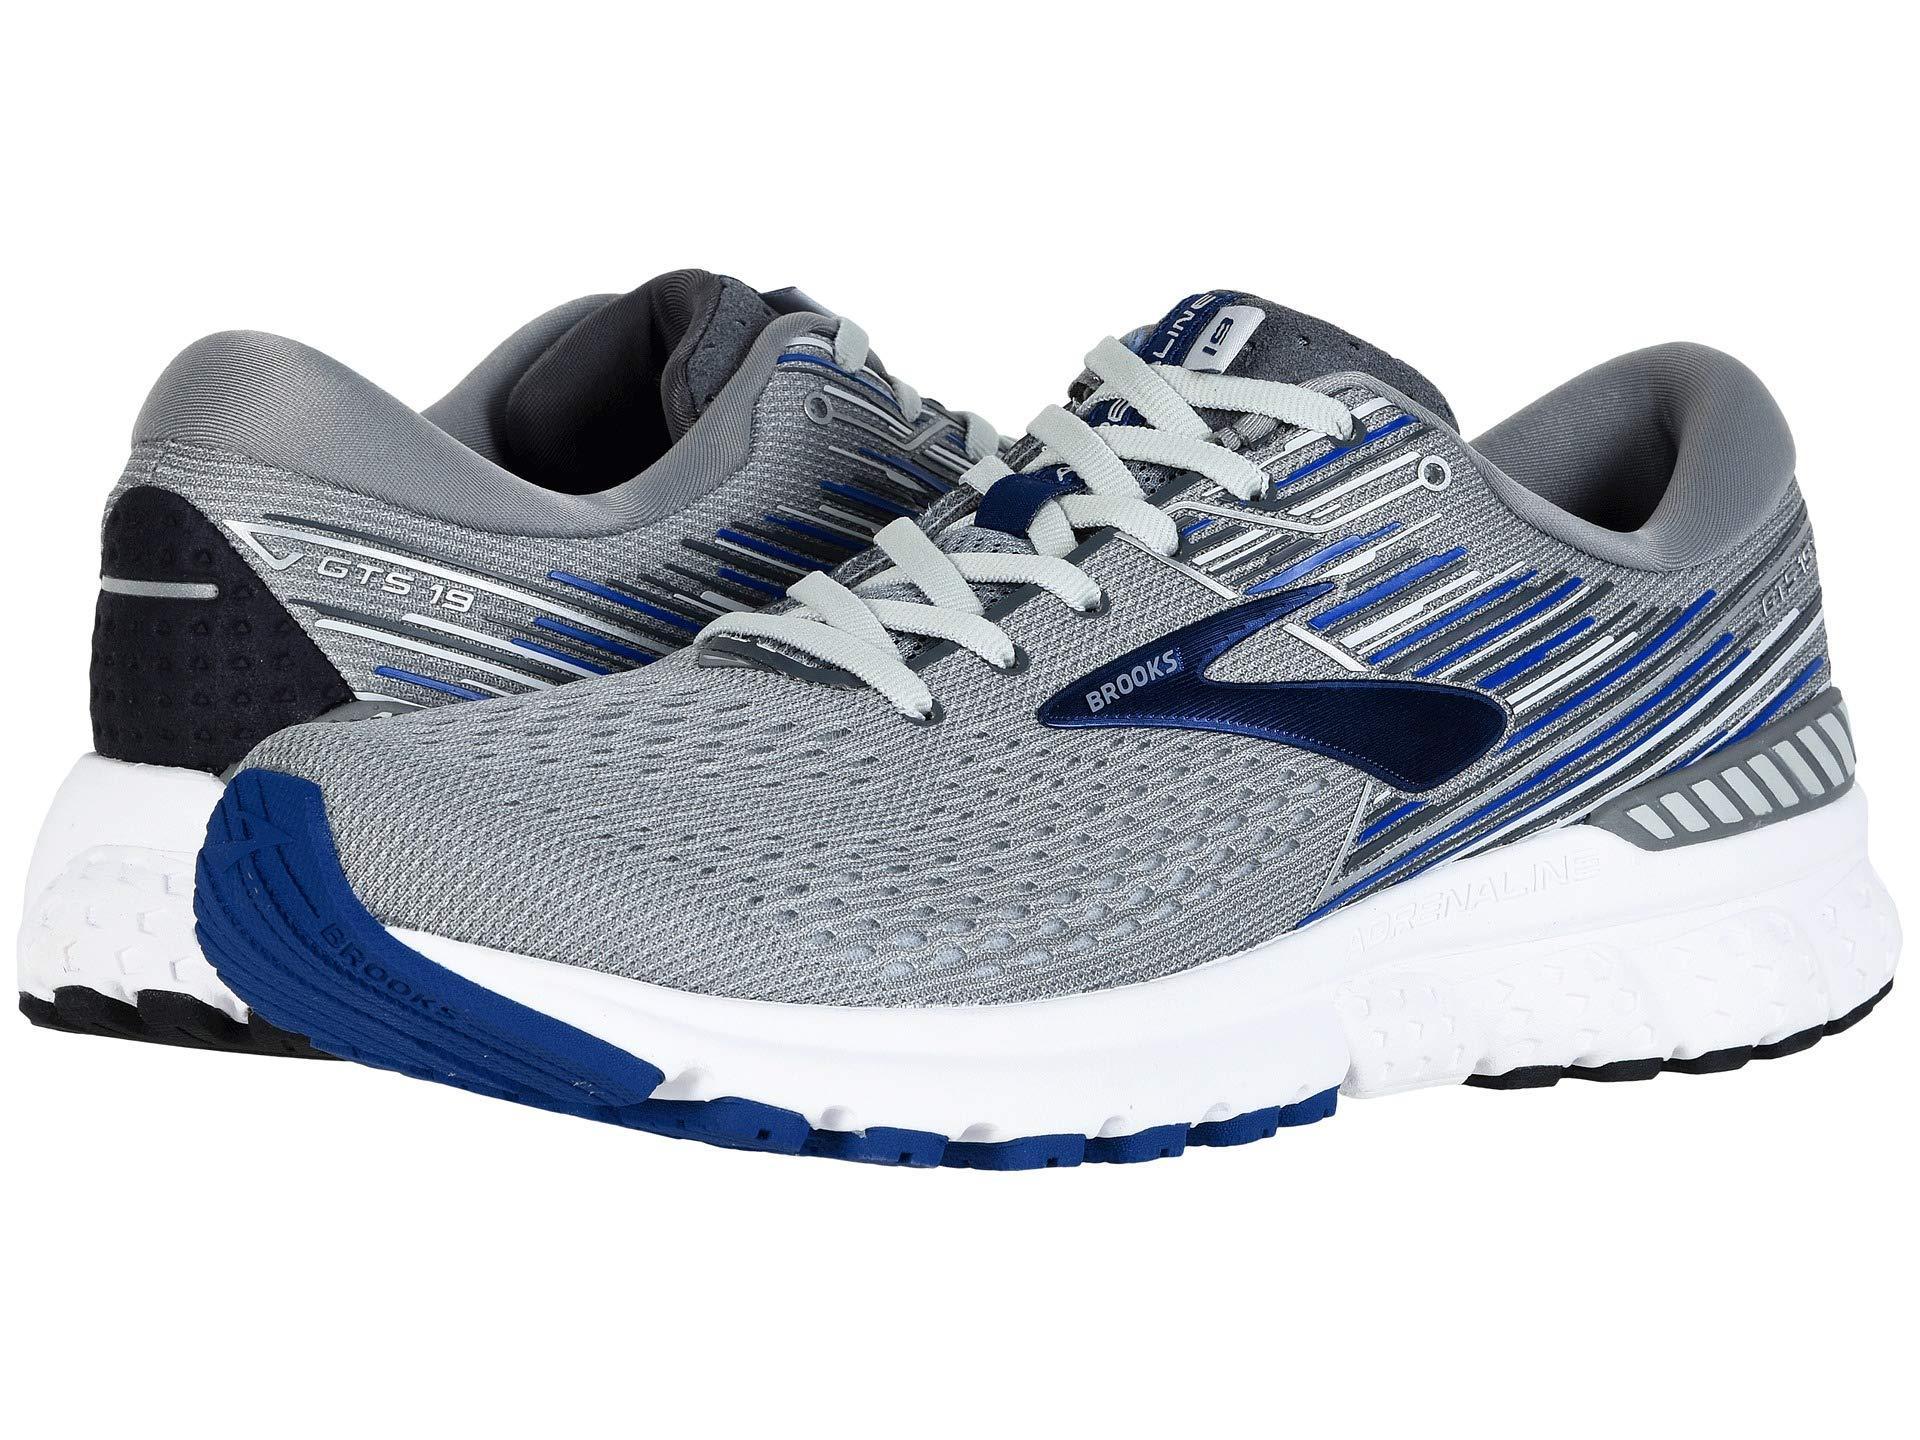 92d577088 ... Adrenaline Gts 19 (white grey navy) Men s Running Shoes. View fullscreen